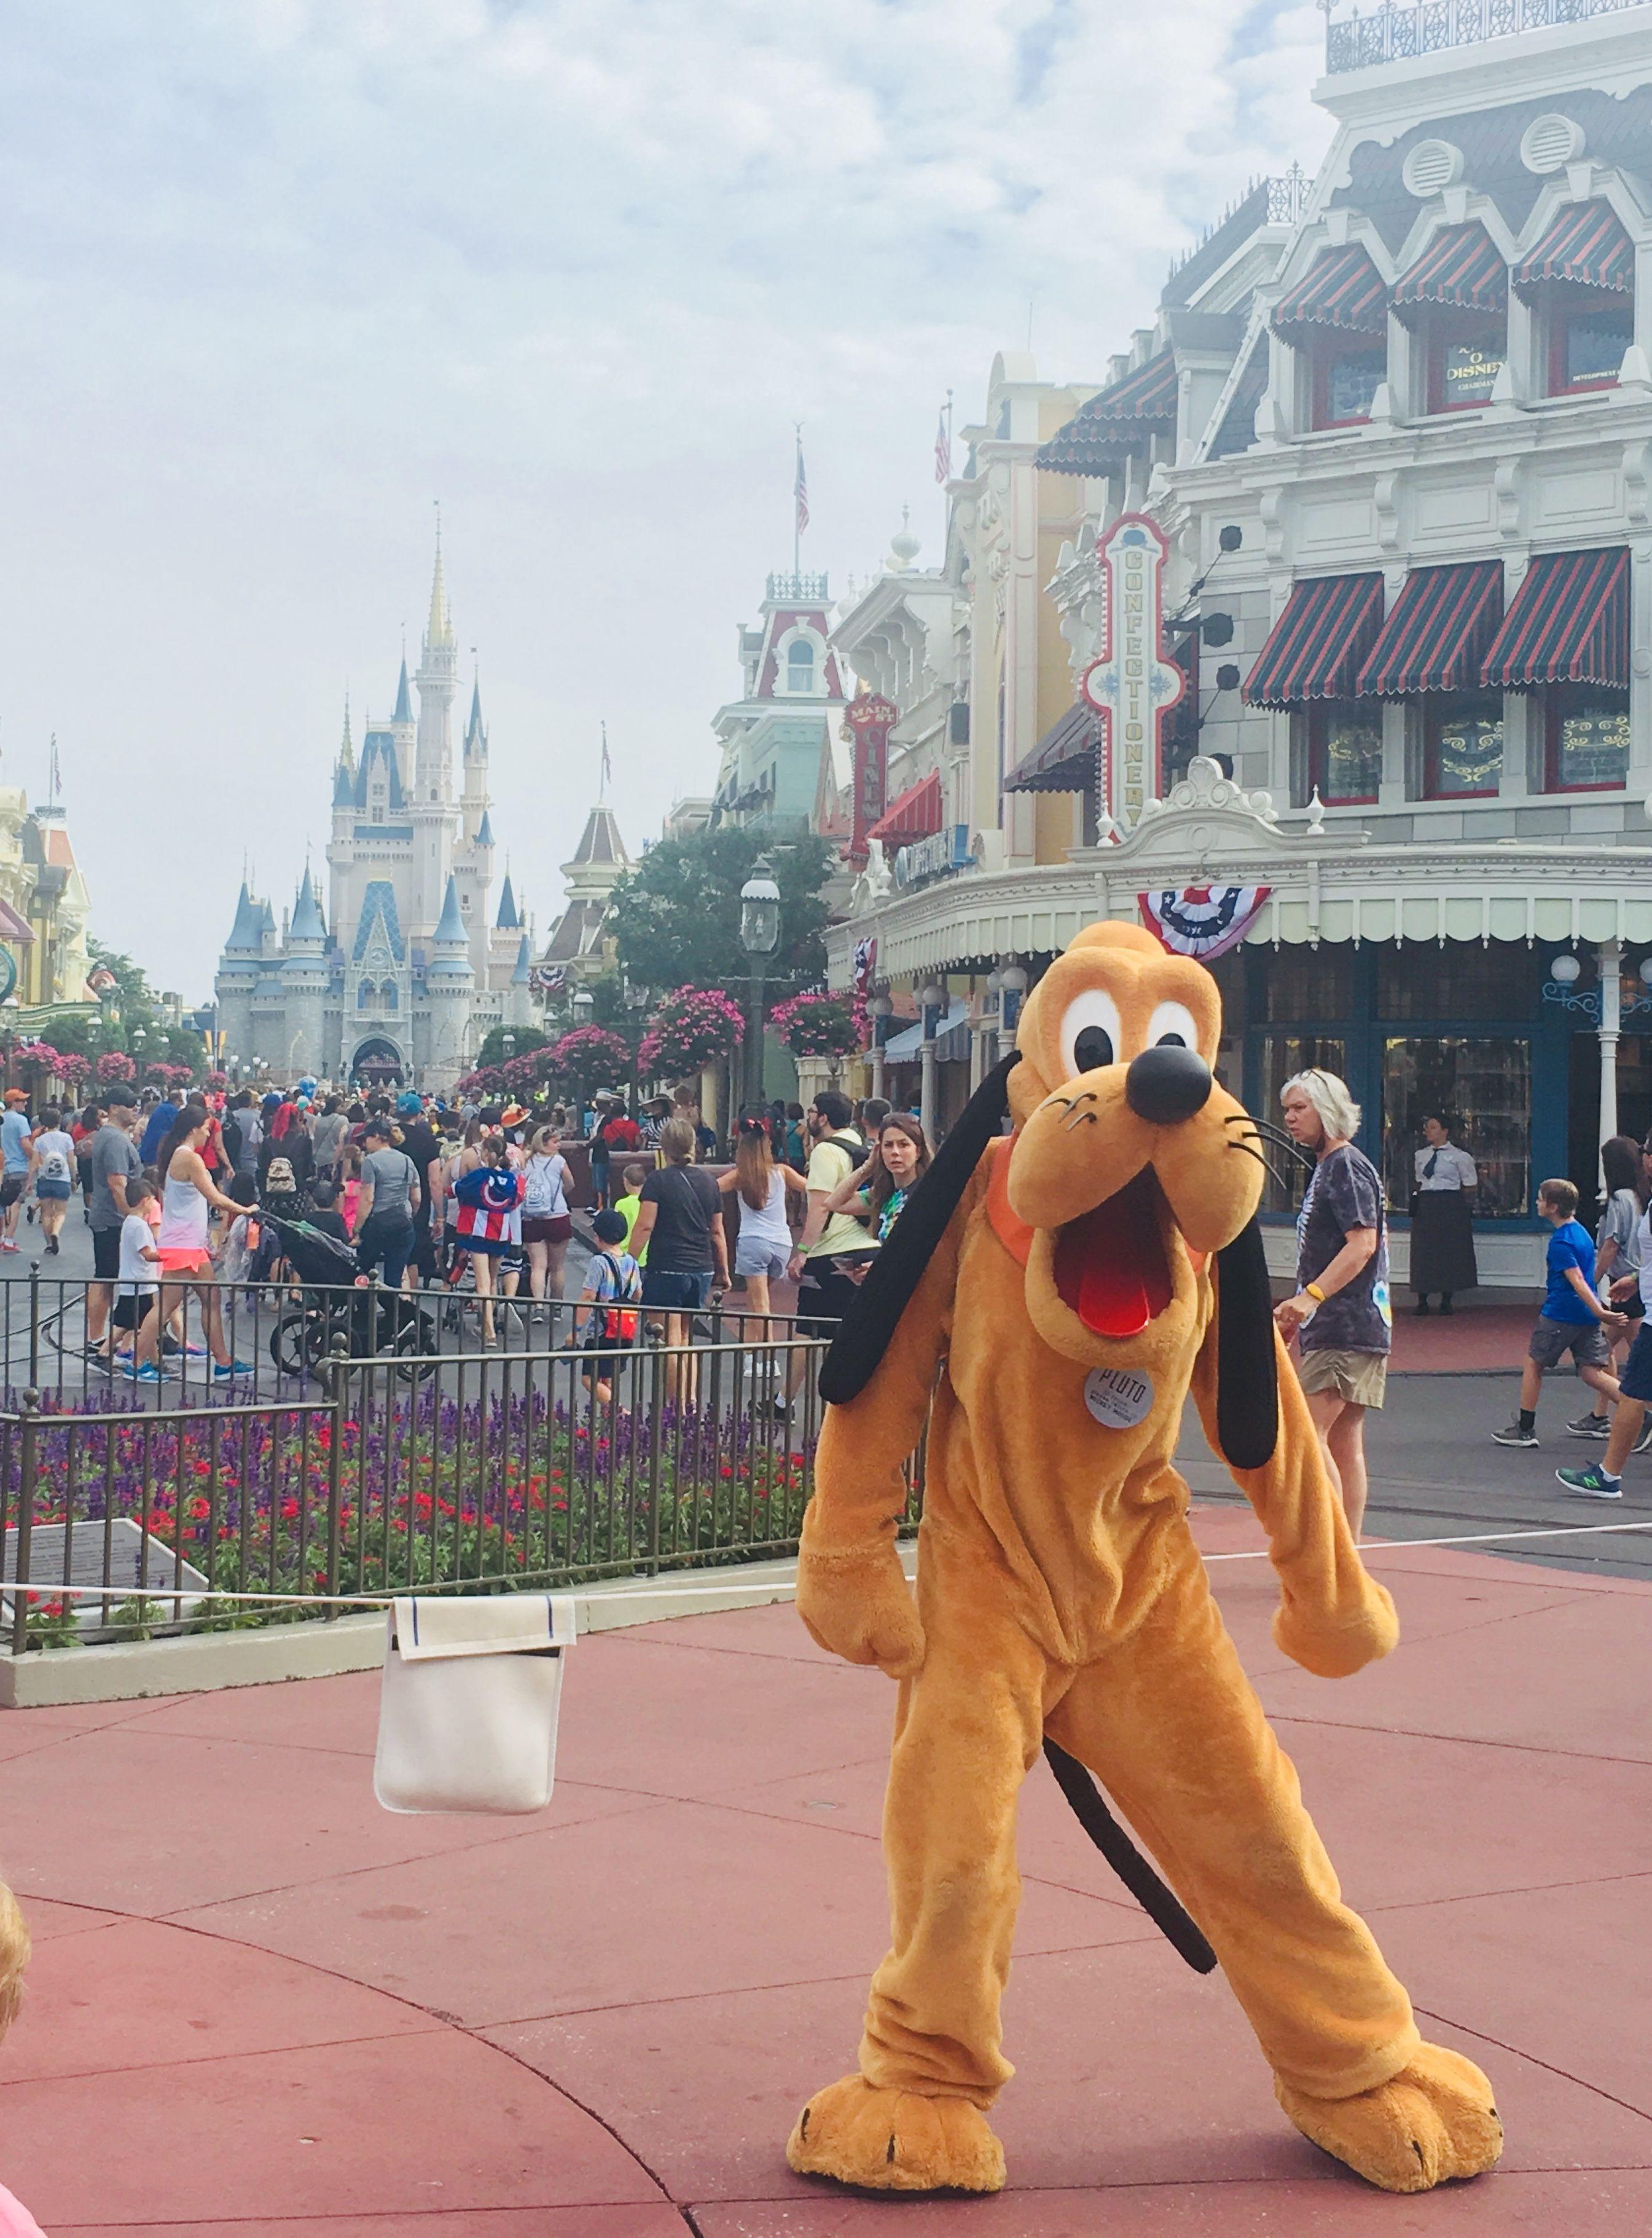 Disney world images pinterest